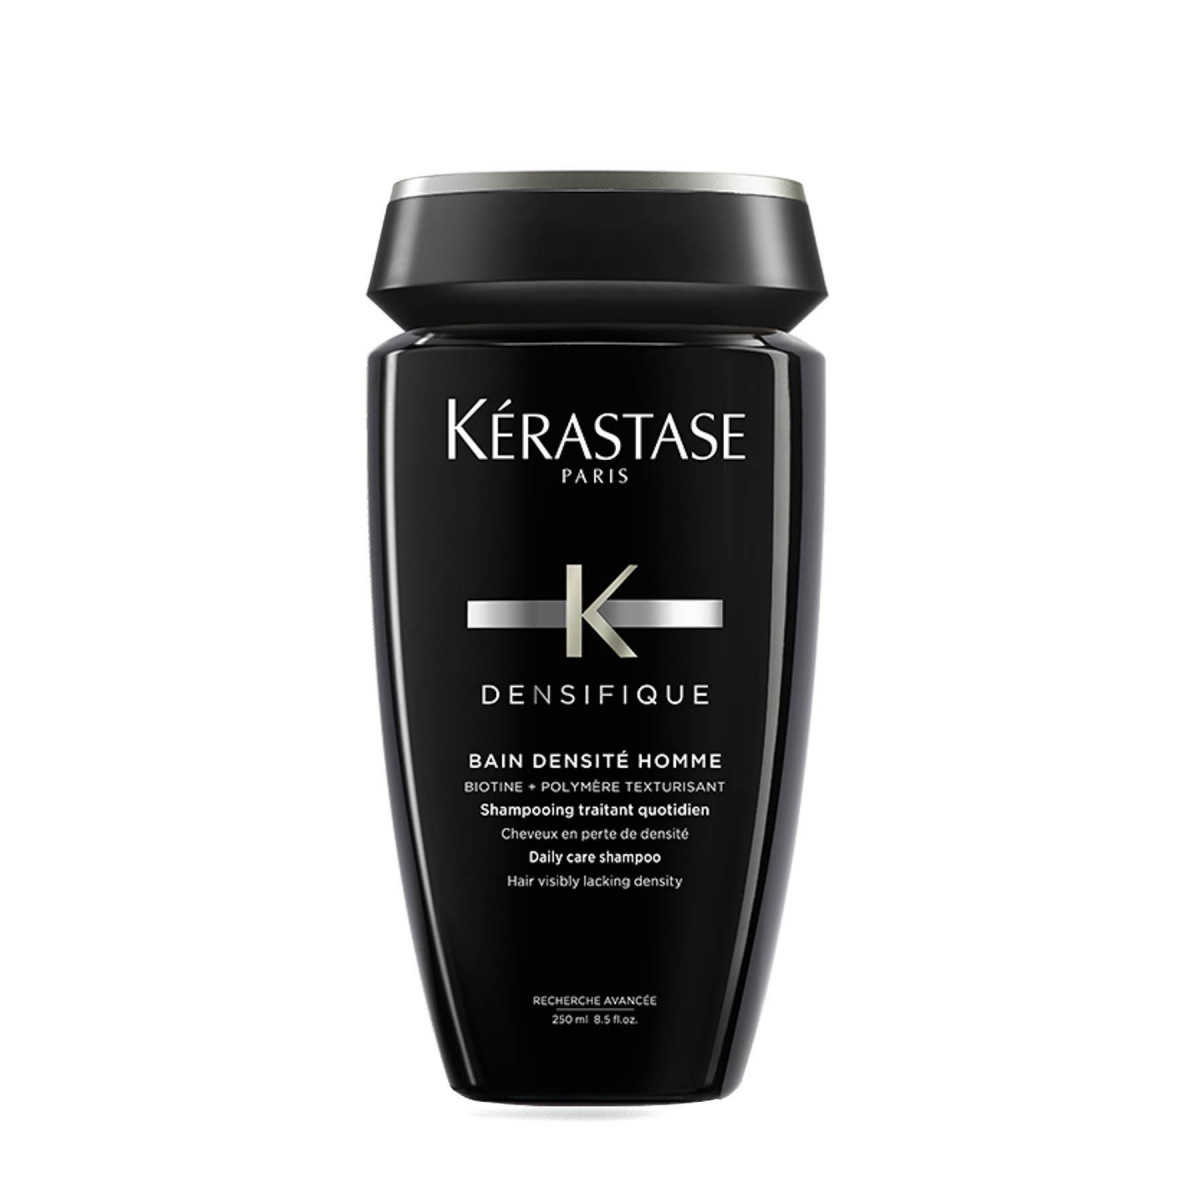 Kerastase Densifique Bain Densite Homme Şampuan 250ml